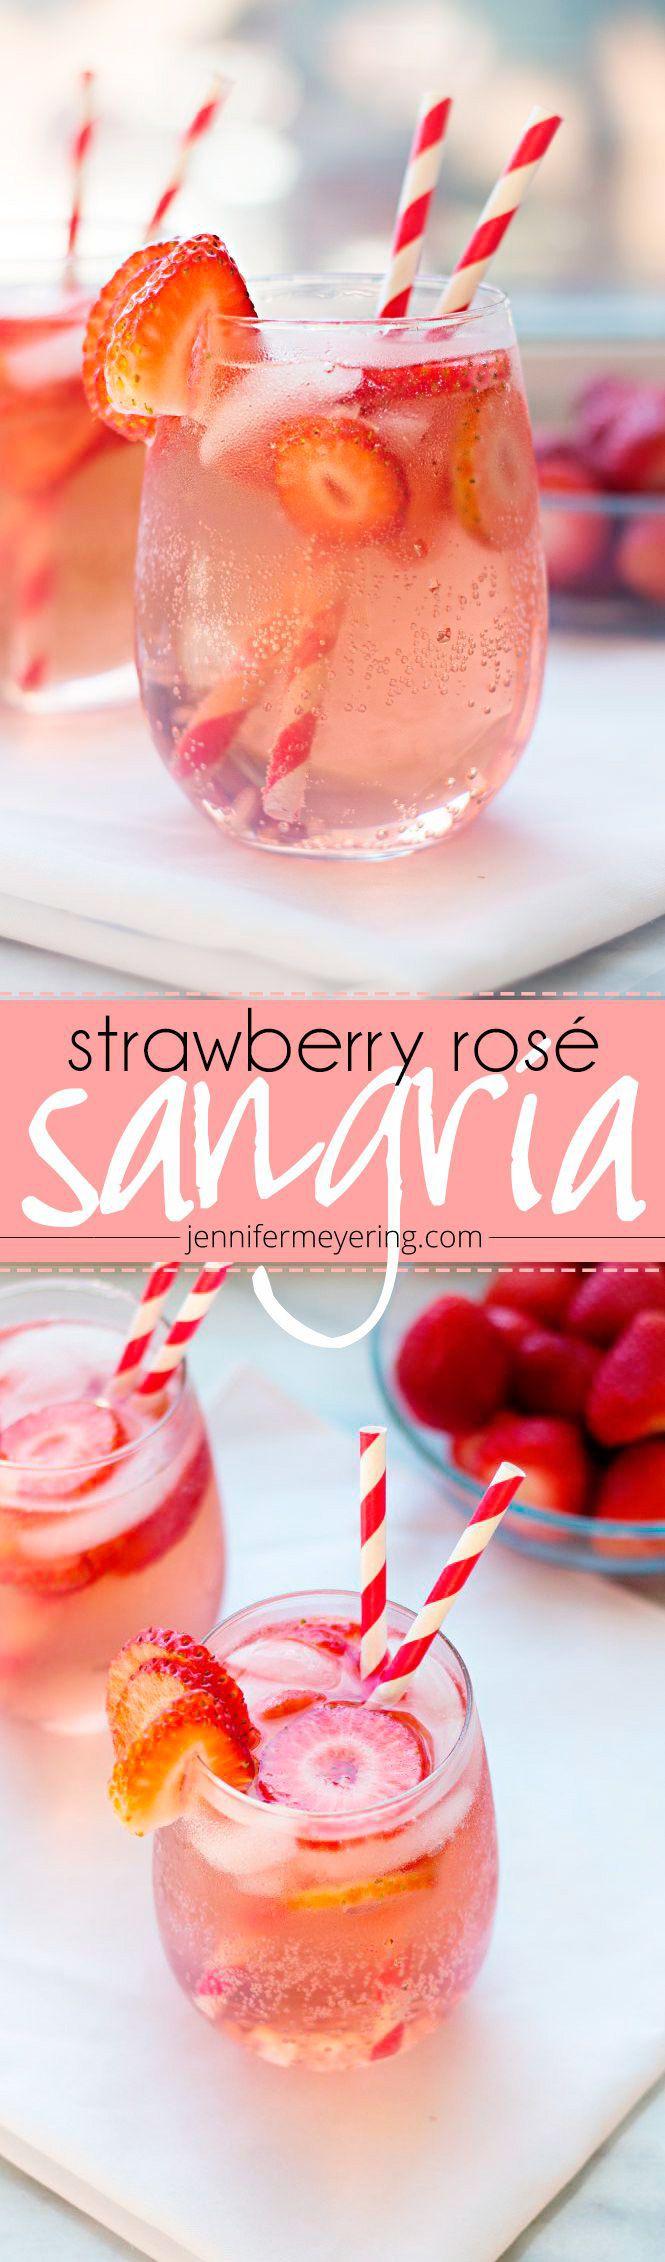 Strawberry Rosé Sangria | JenniferMeyering.com